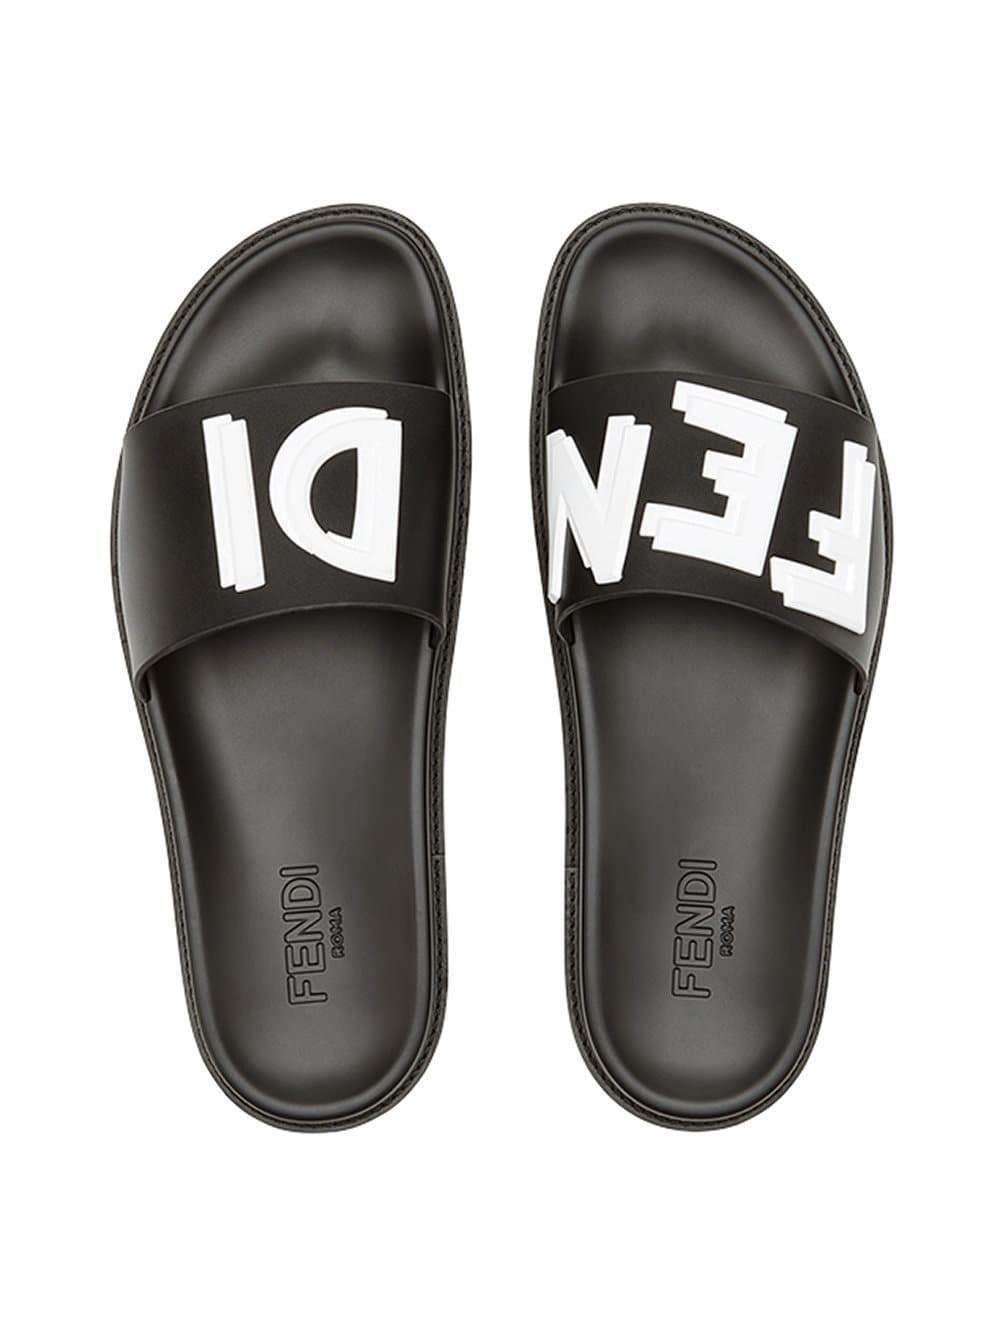 46b126b9 Fendi sandal in 2019 | my designers | Fendi, Sandals, Fashion